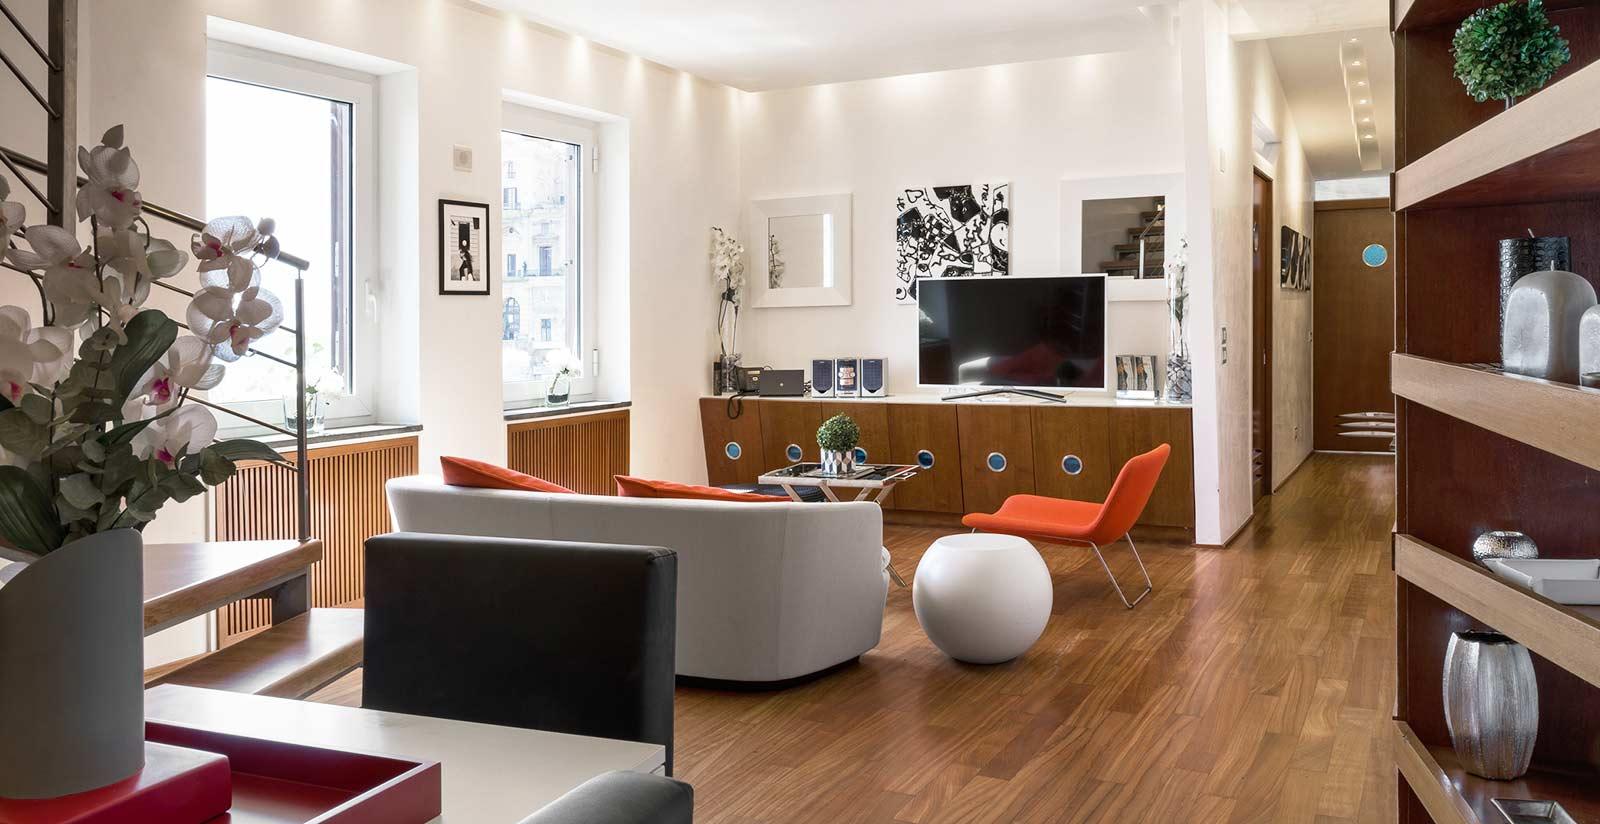 Lhp suites napoli posillipo luxury appartamenti luxury for Appartamenti napoli